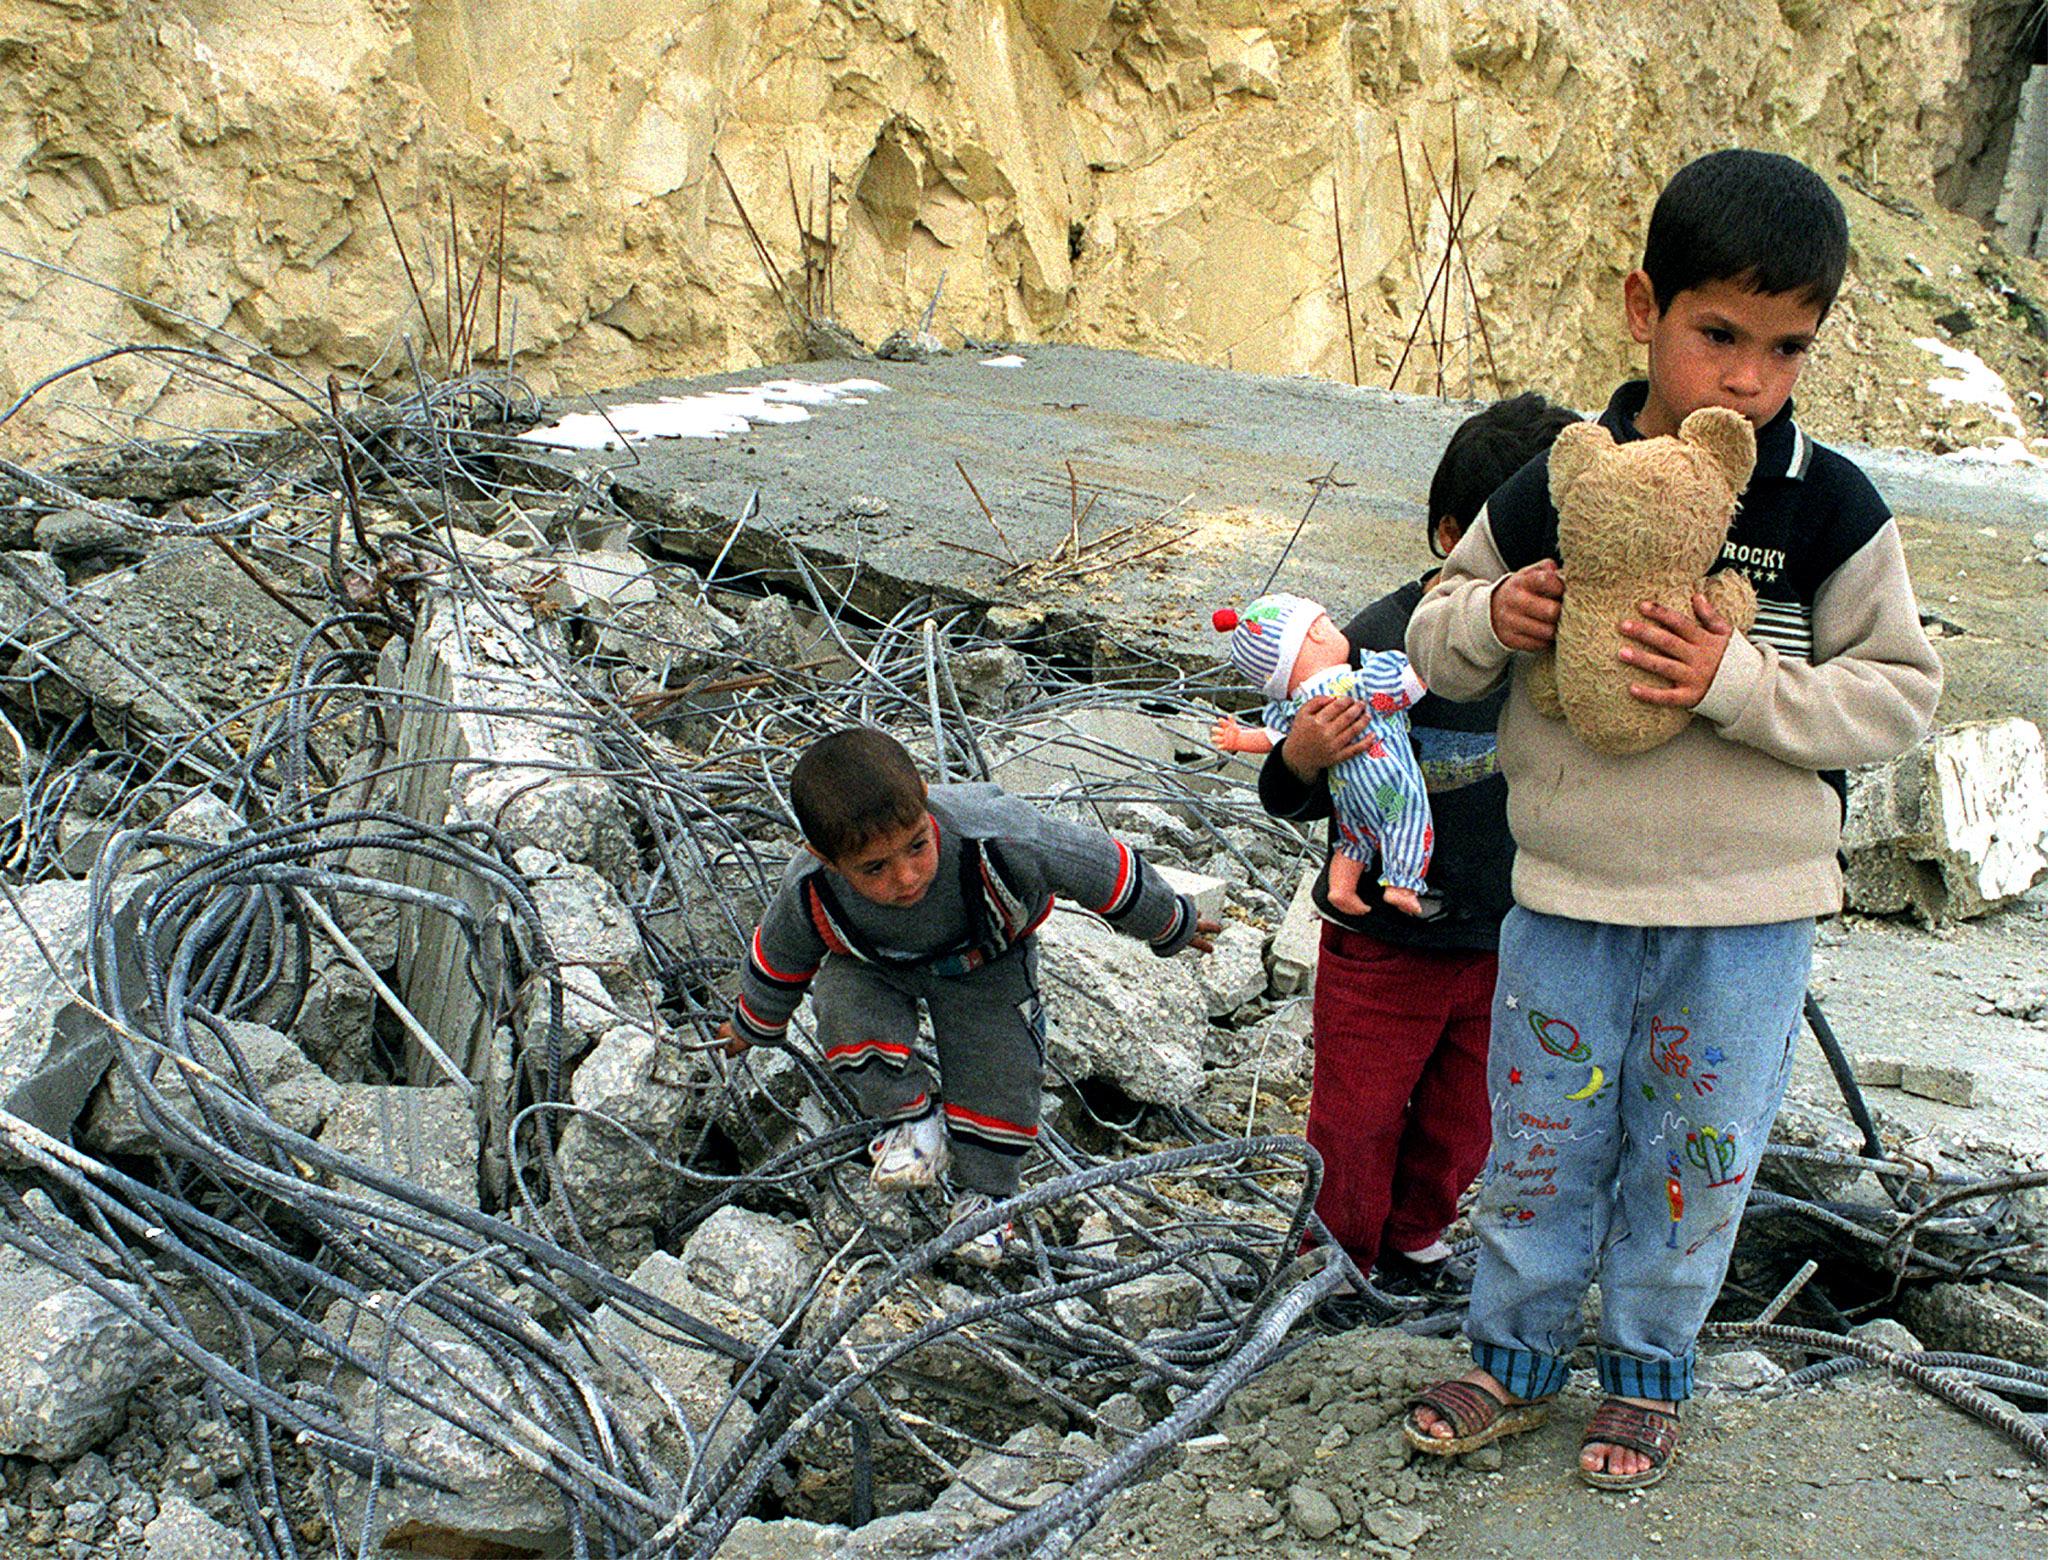 PALESTINIAN CHILDREN WALK THROUGH REMAINS OF DEMOLISHED HOUSE IN ISAWIYAH